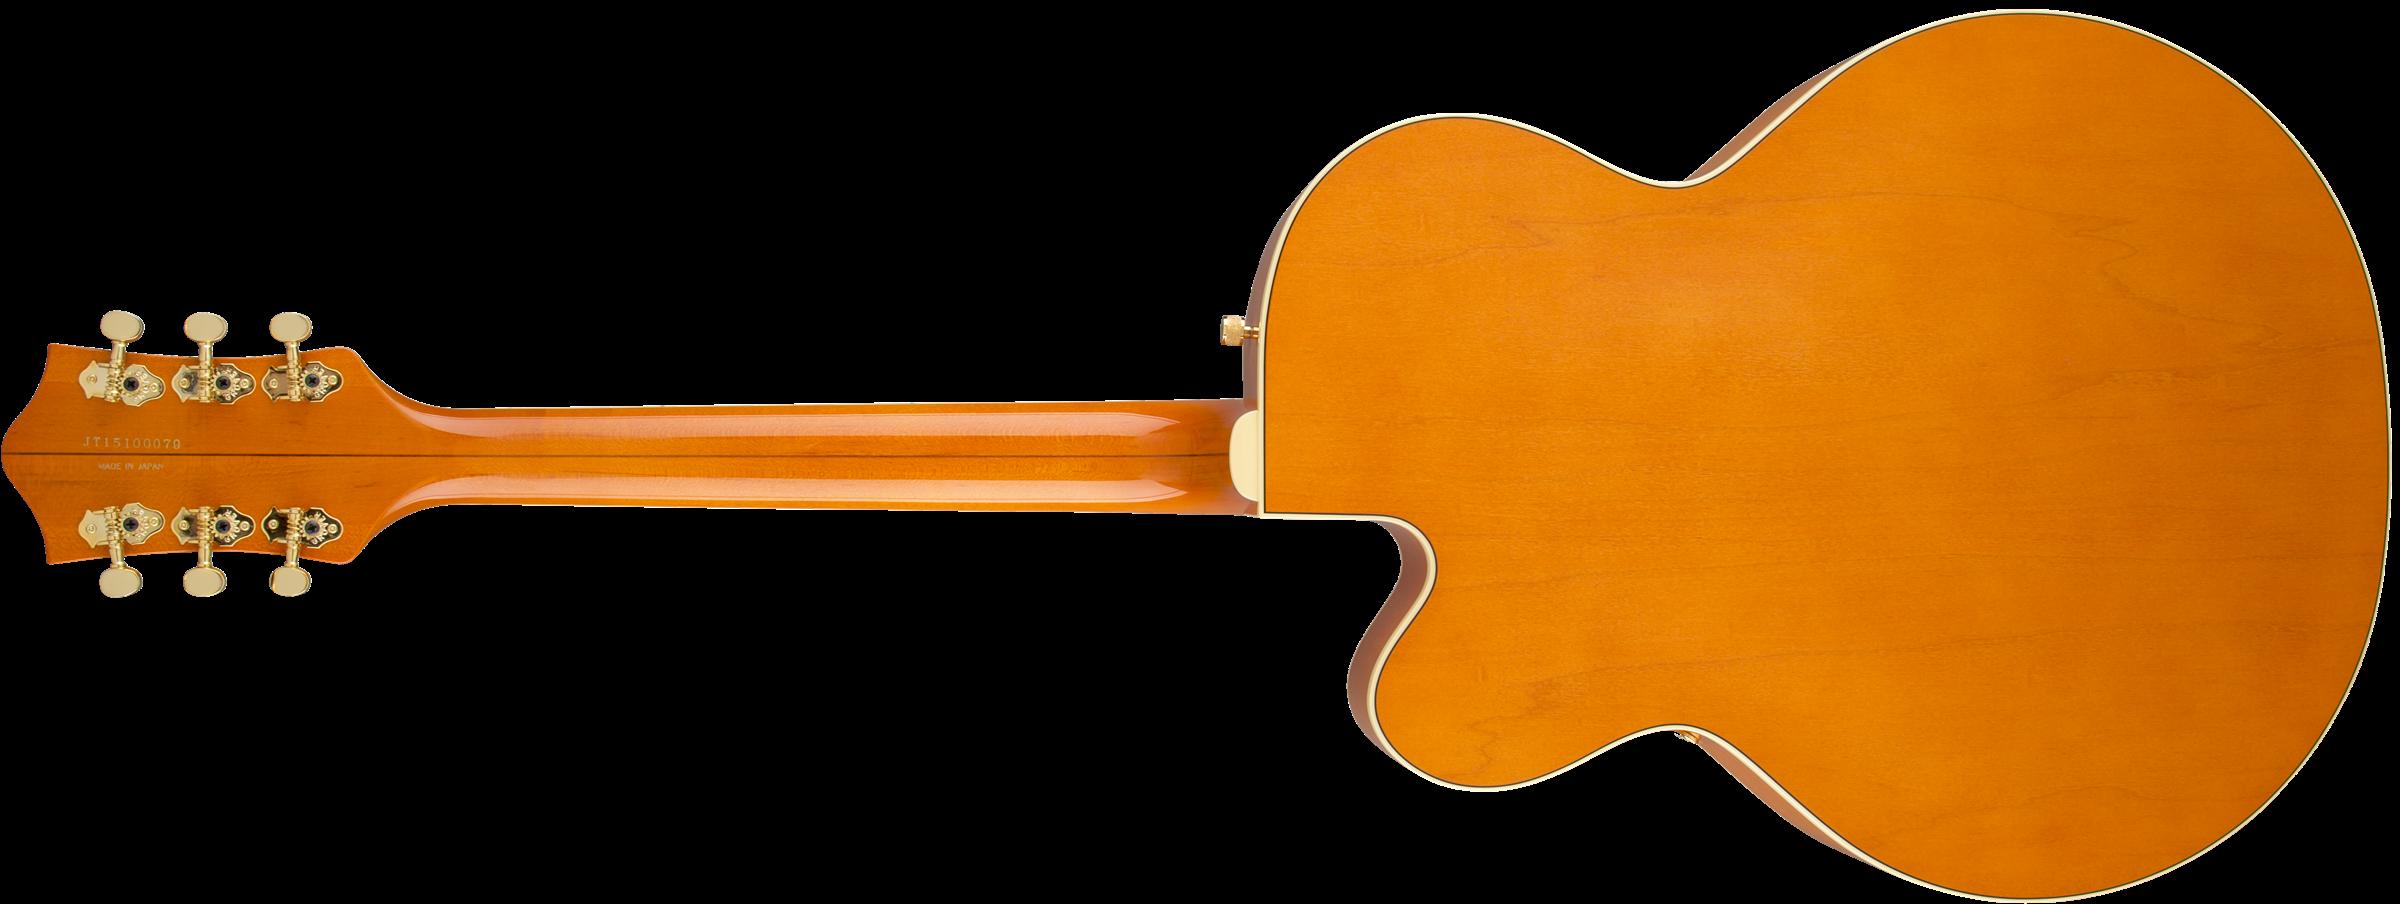 Clipart guitar 50's. Hollow body g t